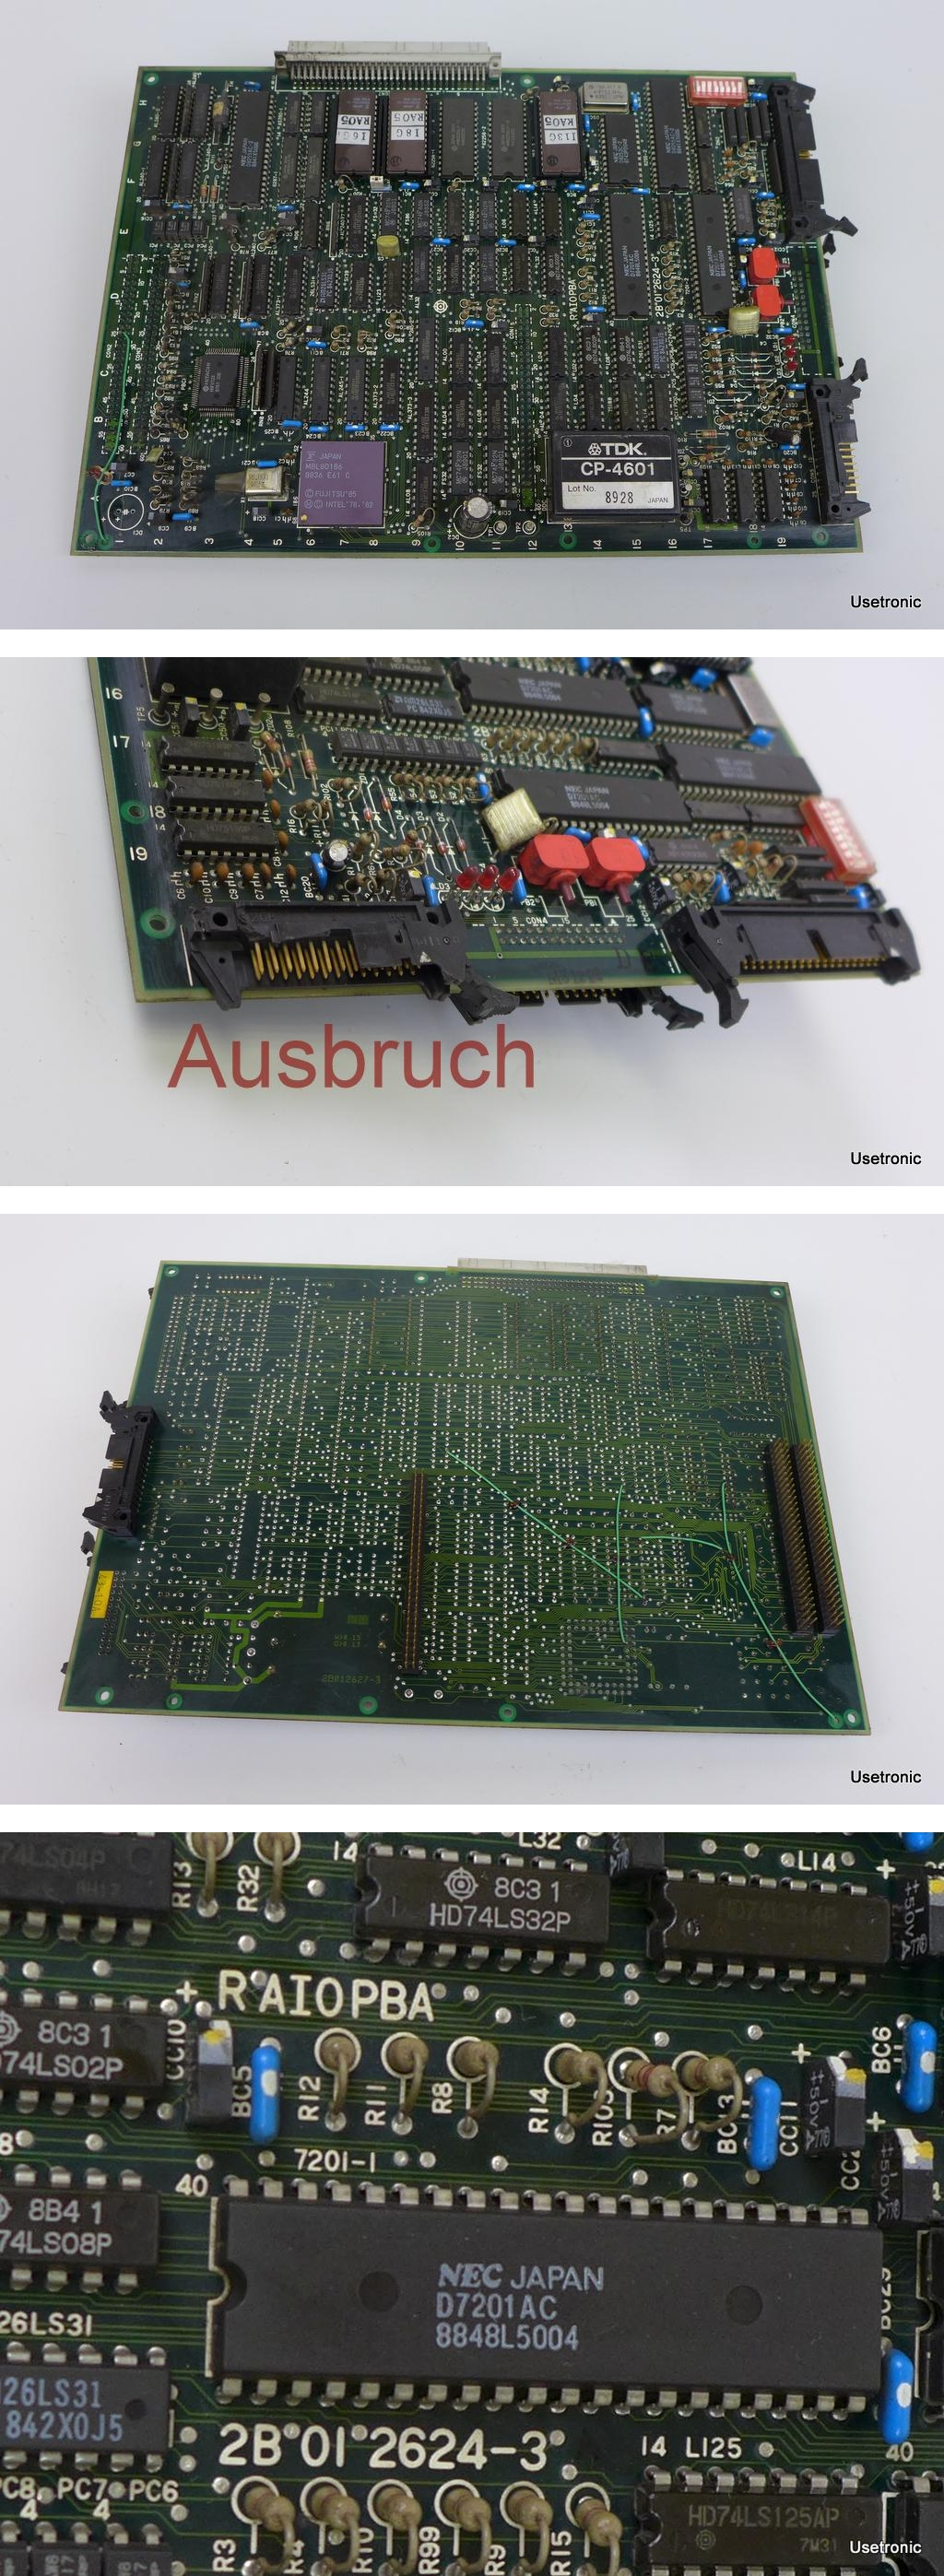 Hitachi RAIOPBA RAI0PBA 2B012624-3